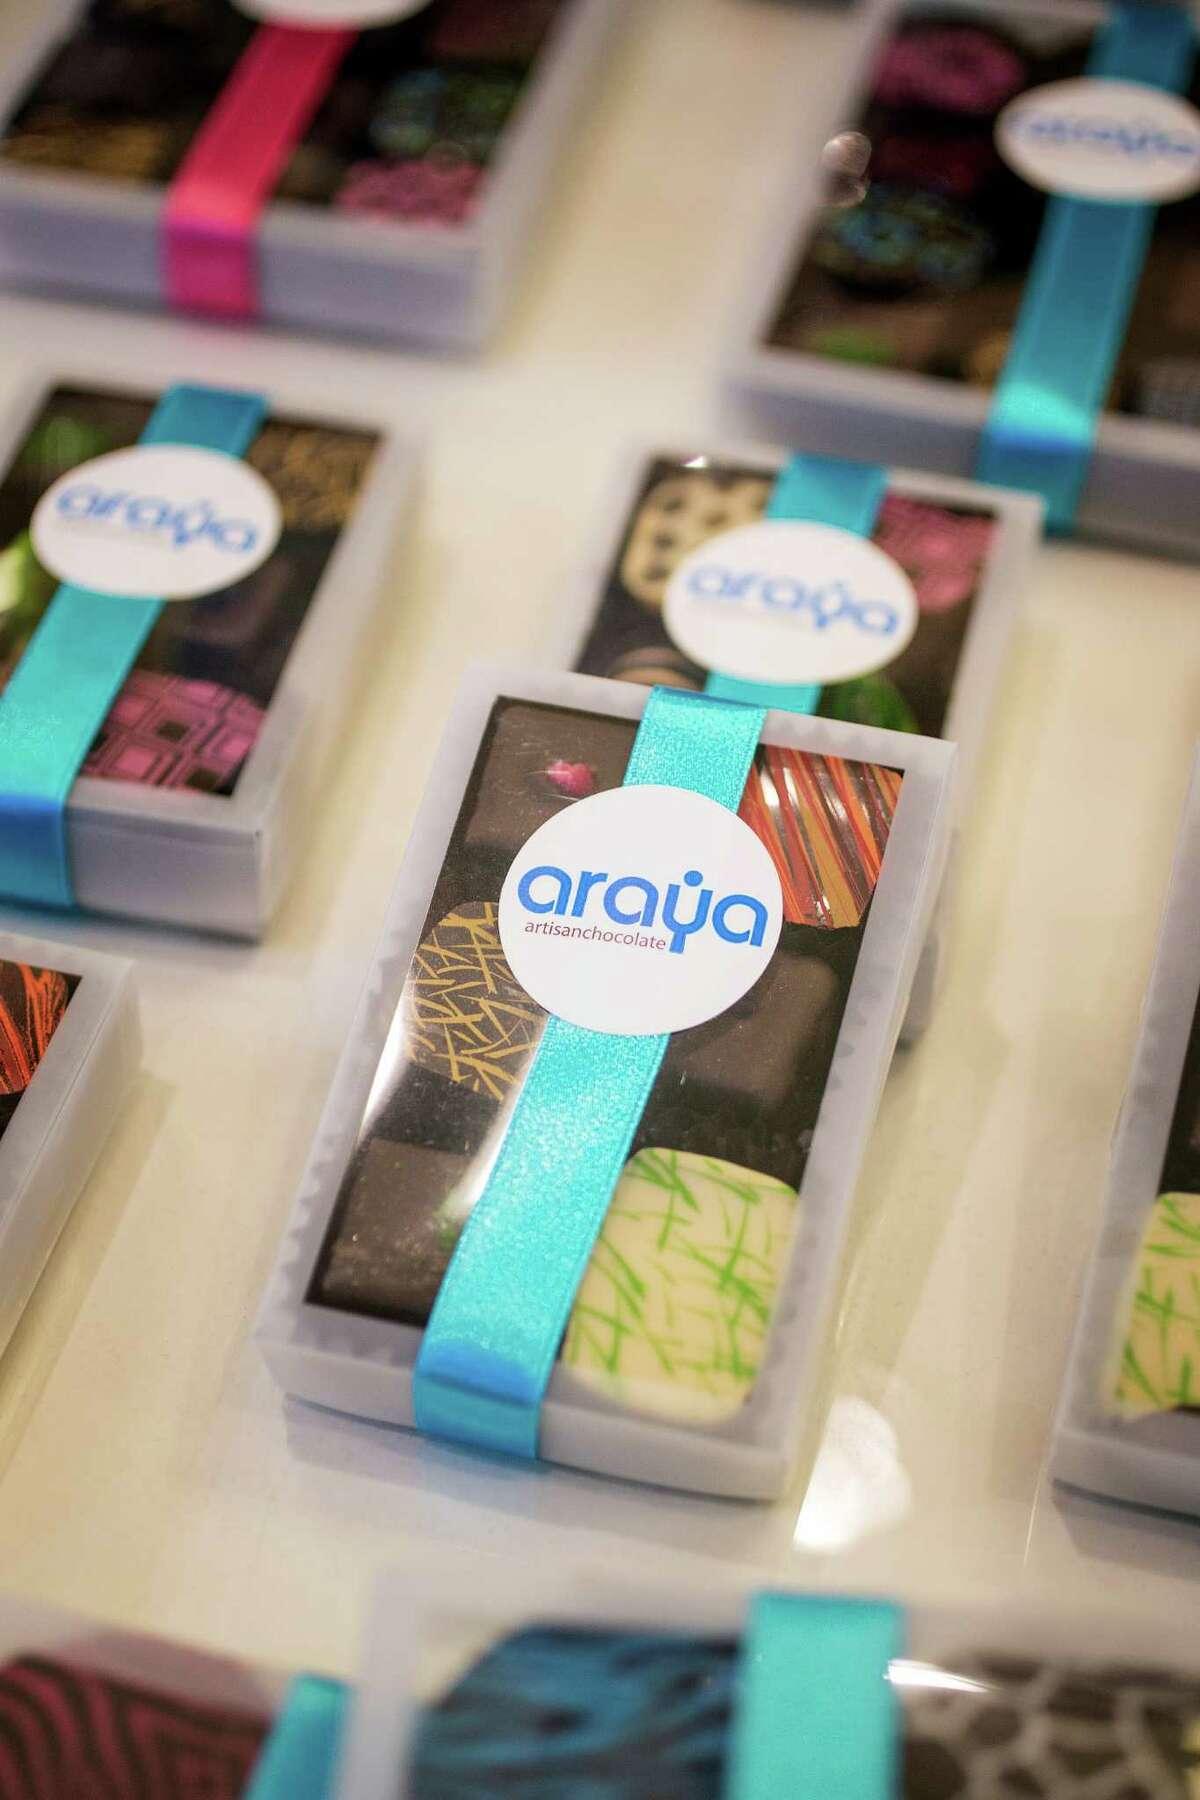 An assortment of chocolates are seen at Araya Artisanal Chocolates in River Oaks